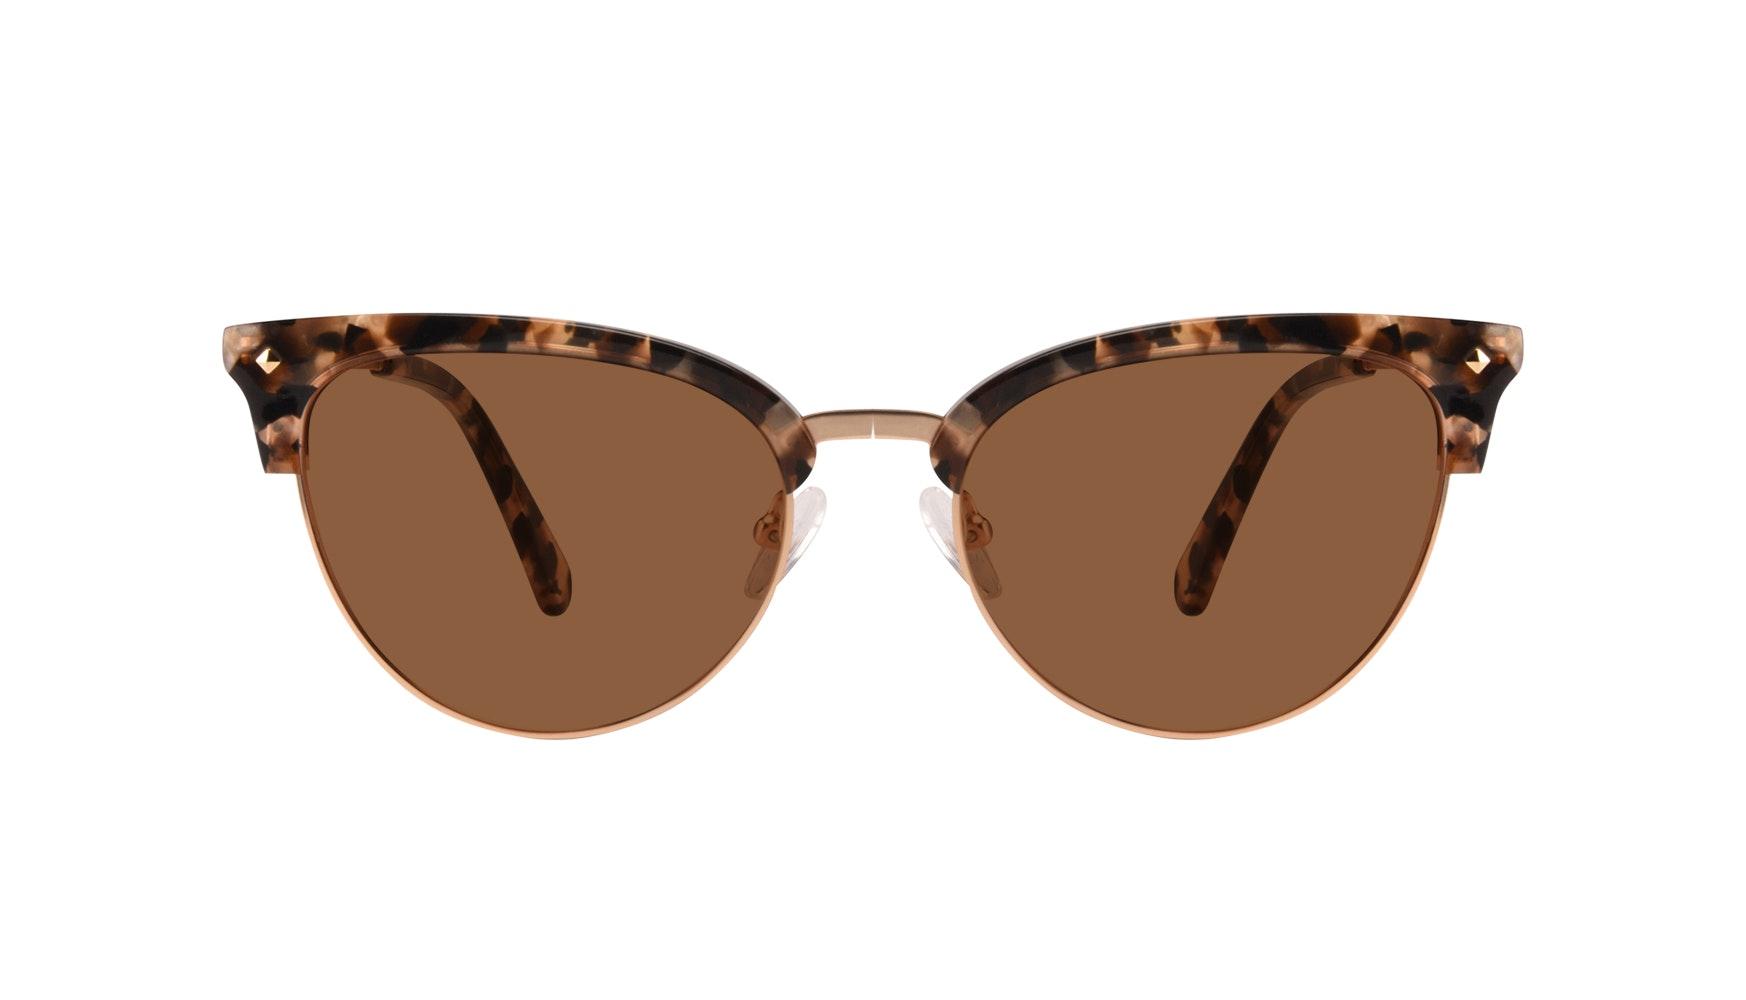 Affordable Fashion Glasses Cat Eye Daring Cateye Eyeglasses Women Moon Gold Flake